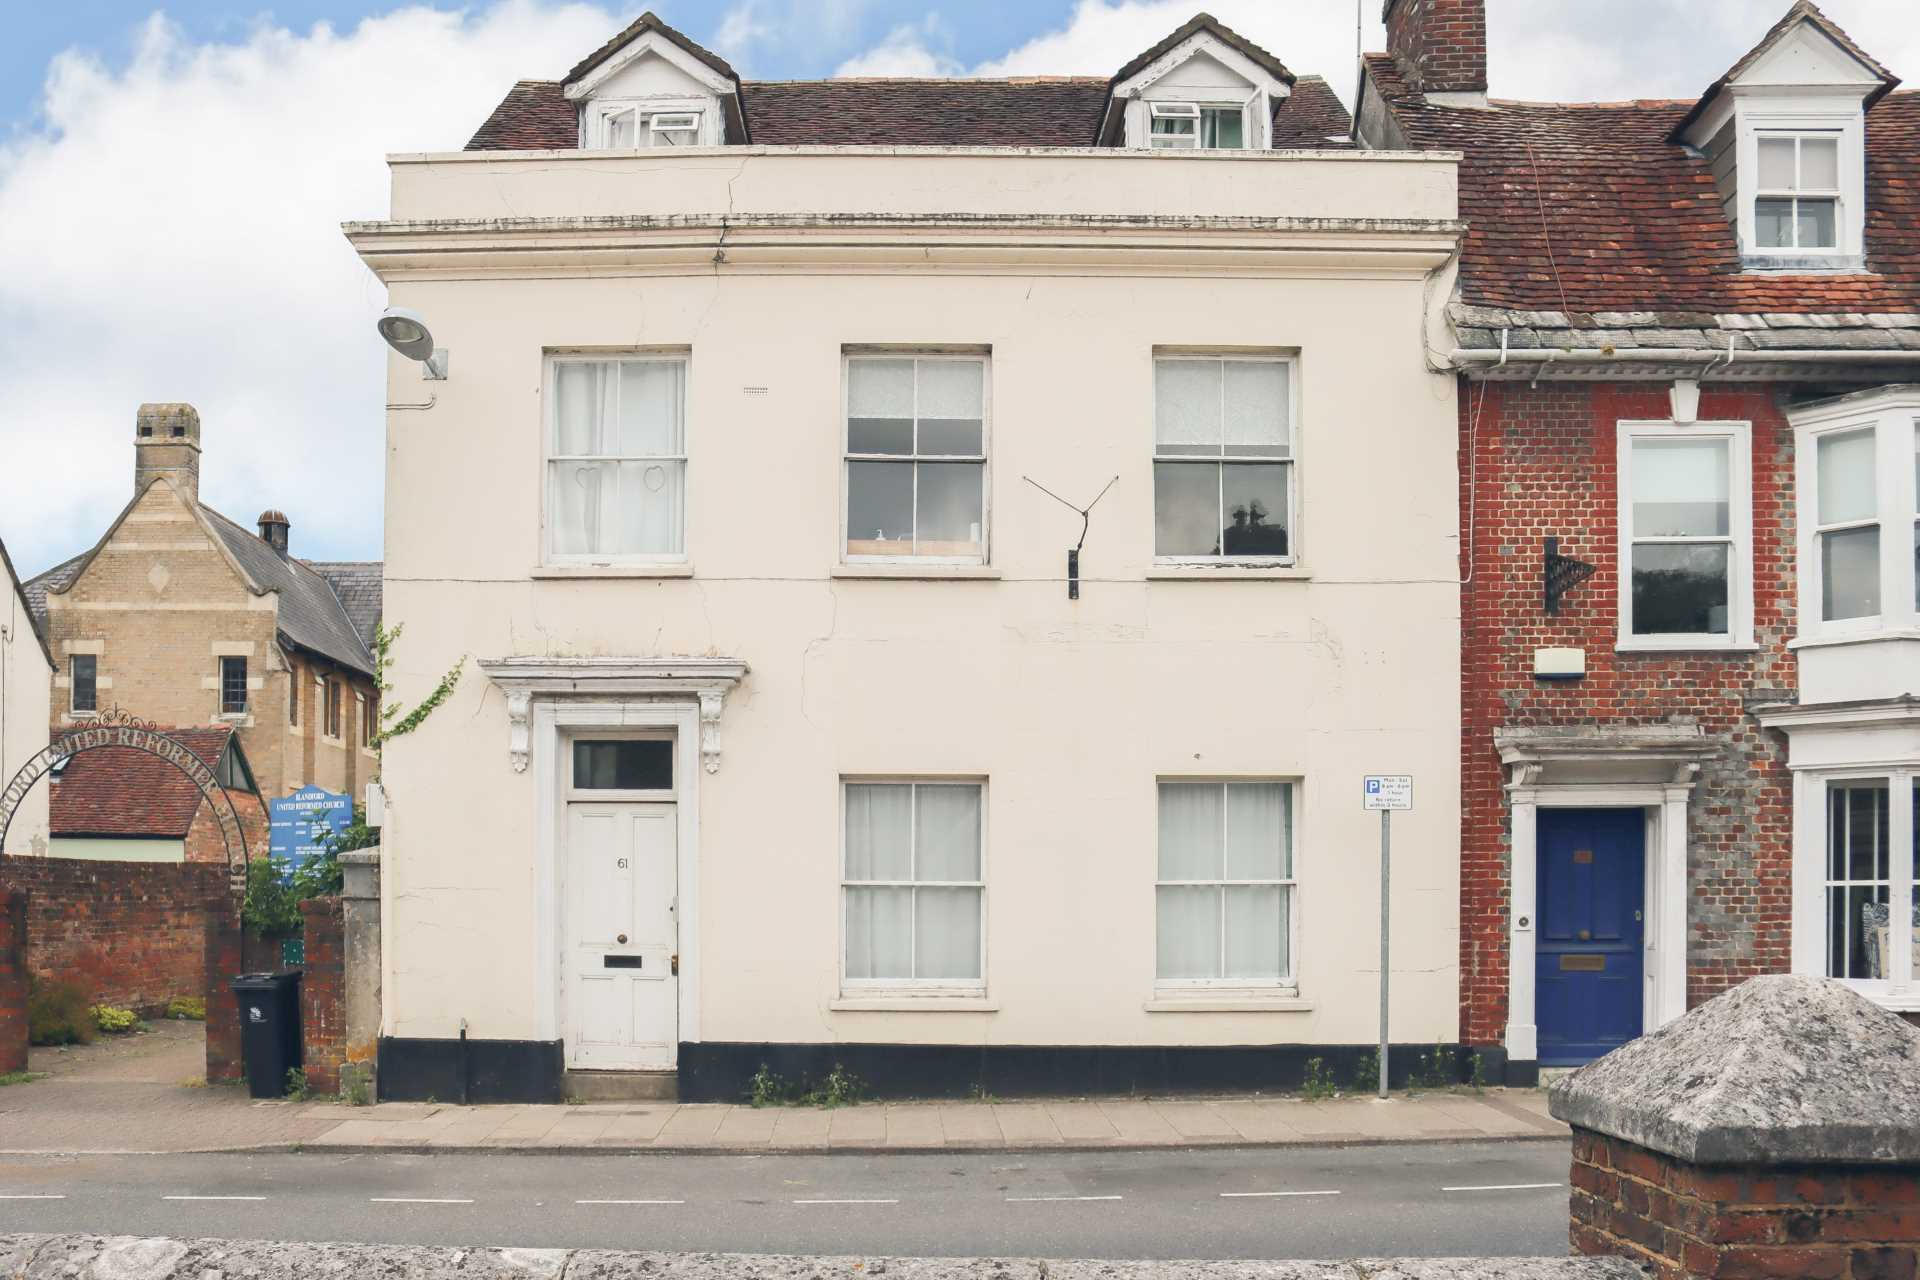 2 bed flat for sale in Salisbury Street, Blandford Forum, Blandford Forum - Property Image 1